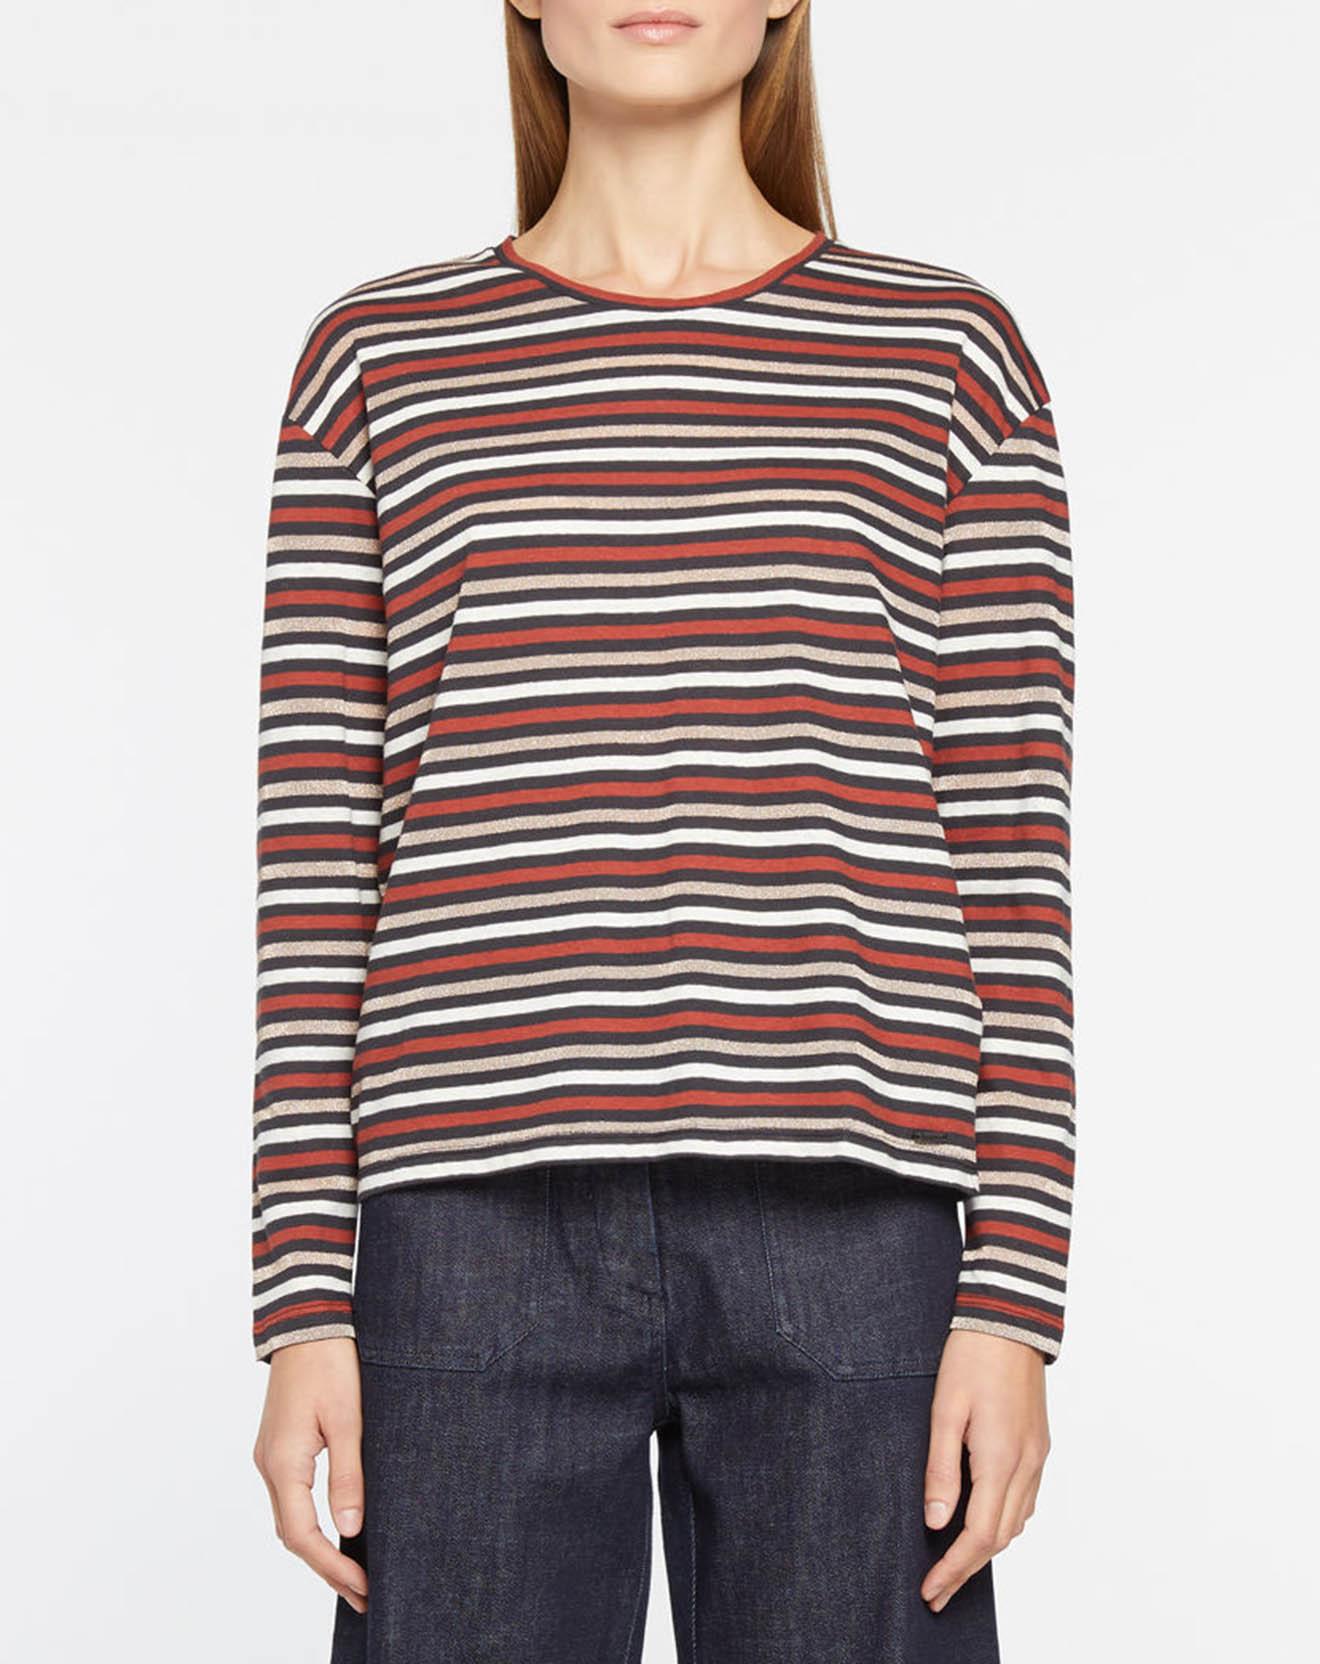 T-Shirt en Lin mélangé rayé - Pepe Jeans - Modalova